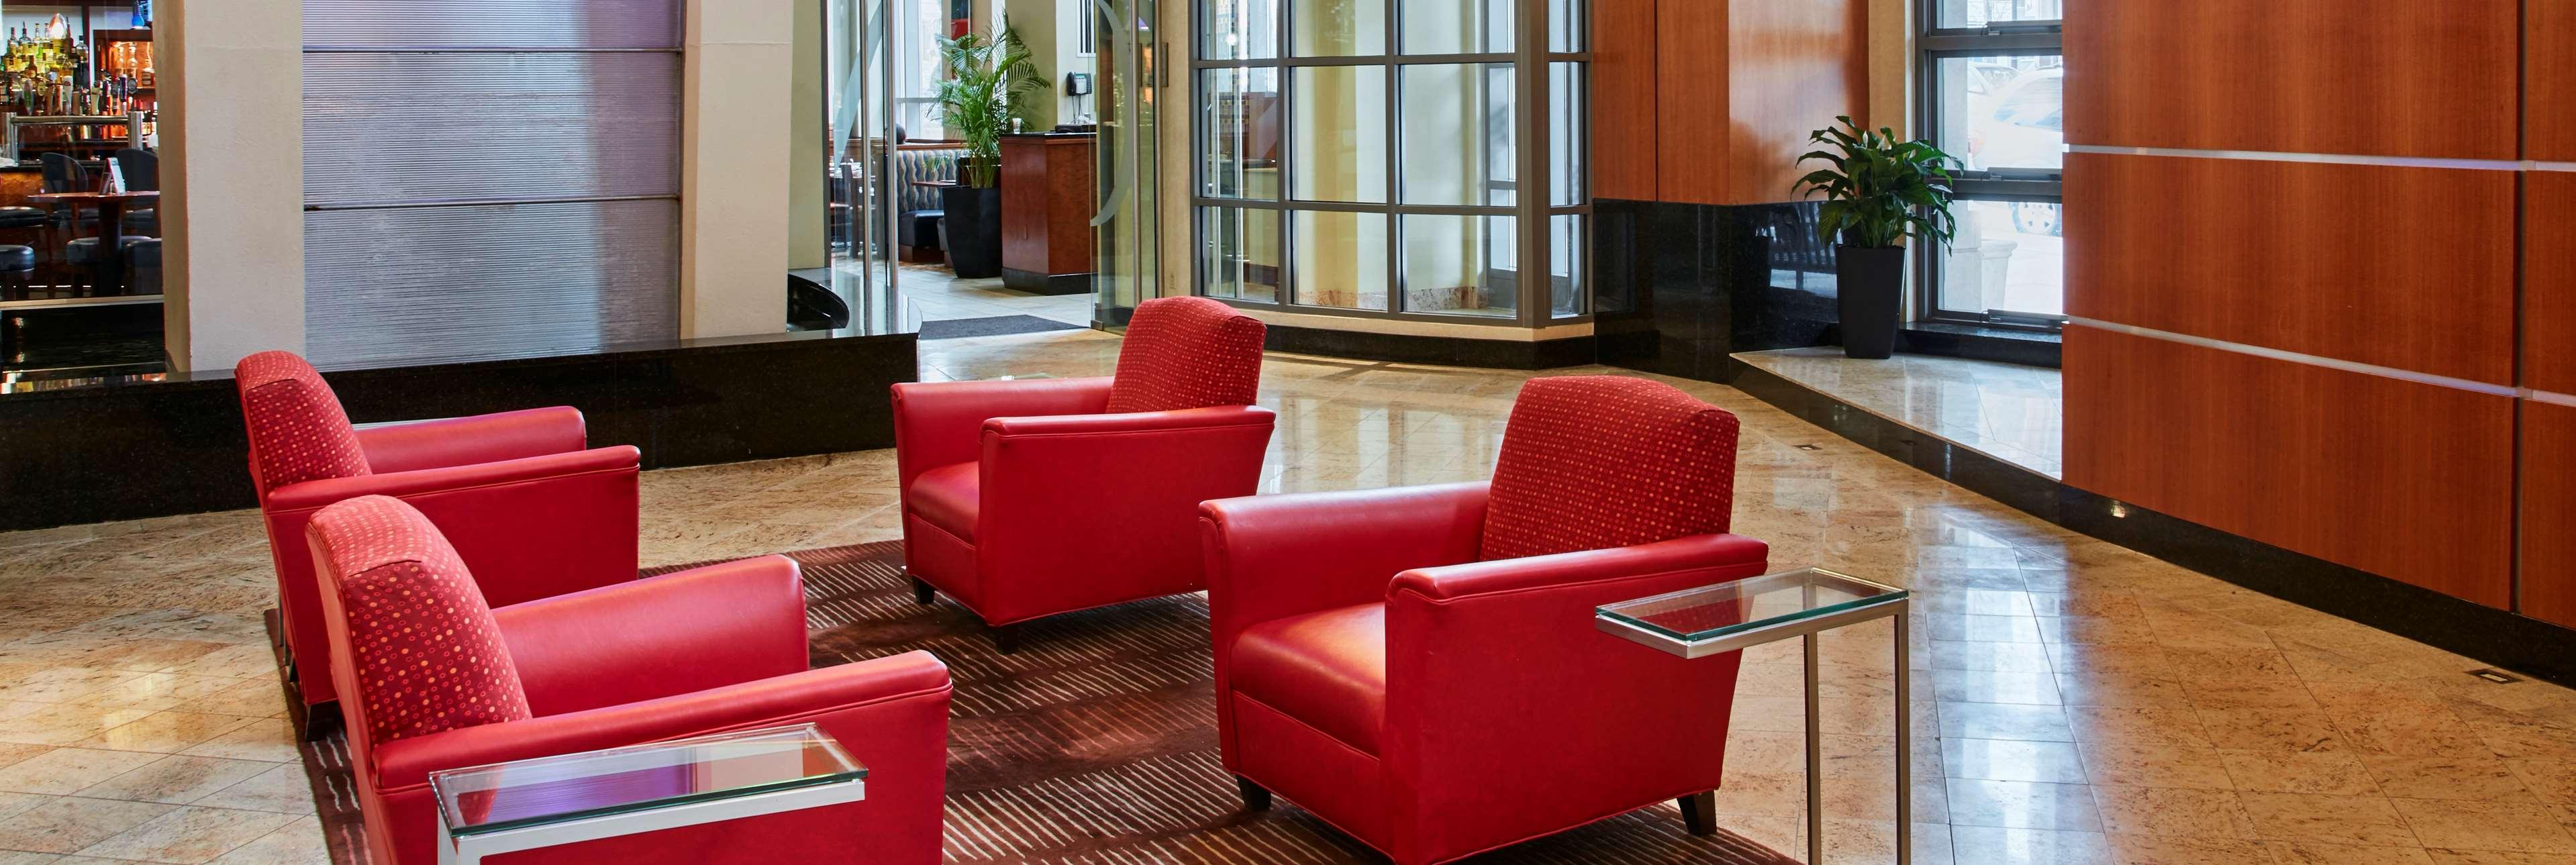 Embassy Suites by Hilton Washington DC Convention Center image 2